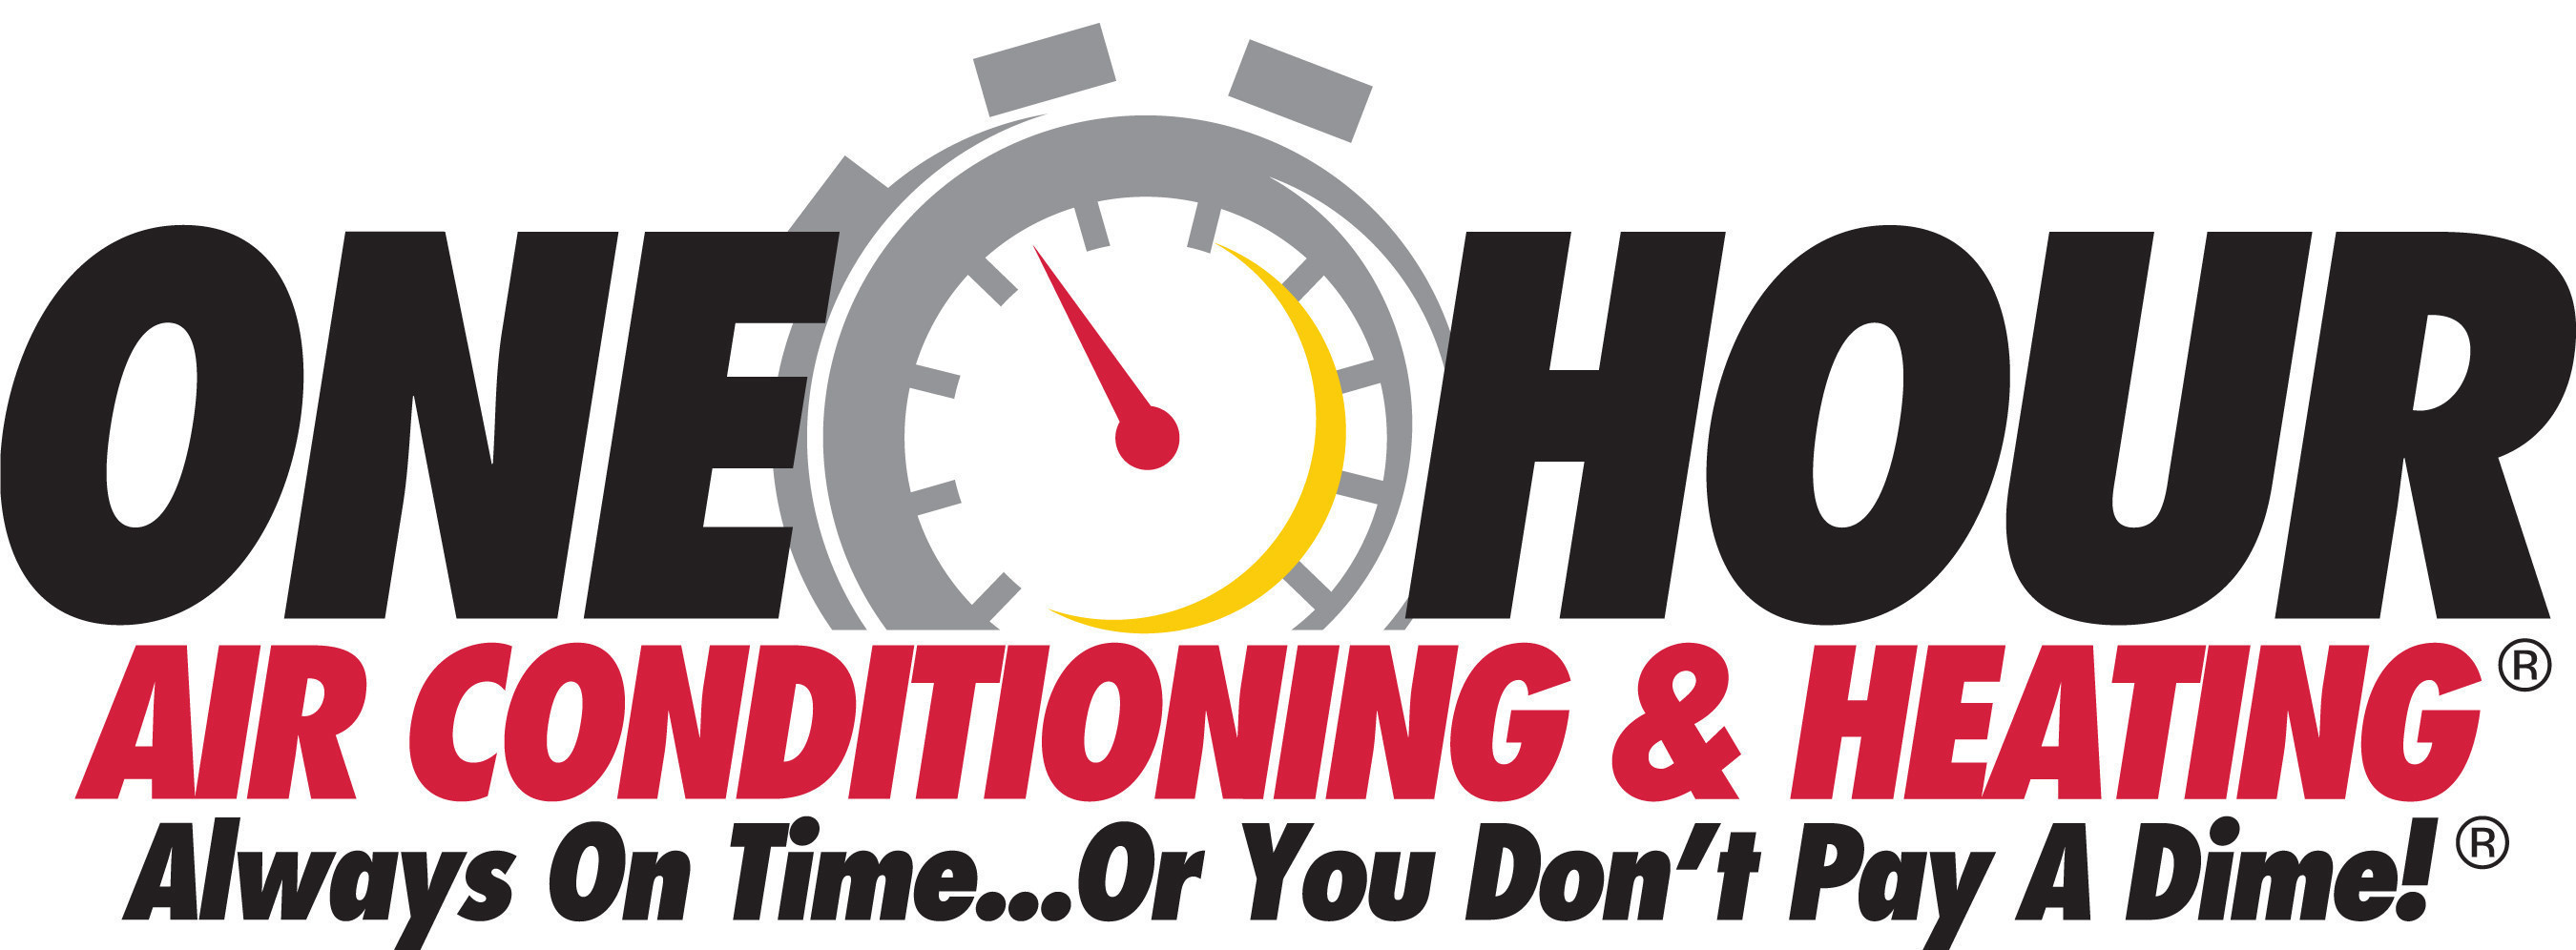 One Hour Air Conditioning & Heating (PRNewsFoto/One Hour Air Conditioning & Heat)